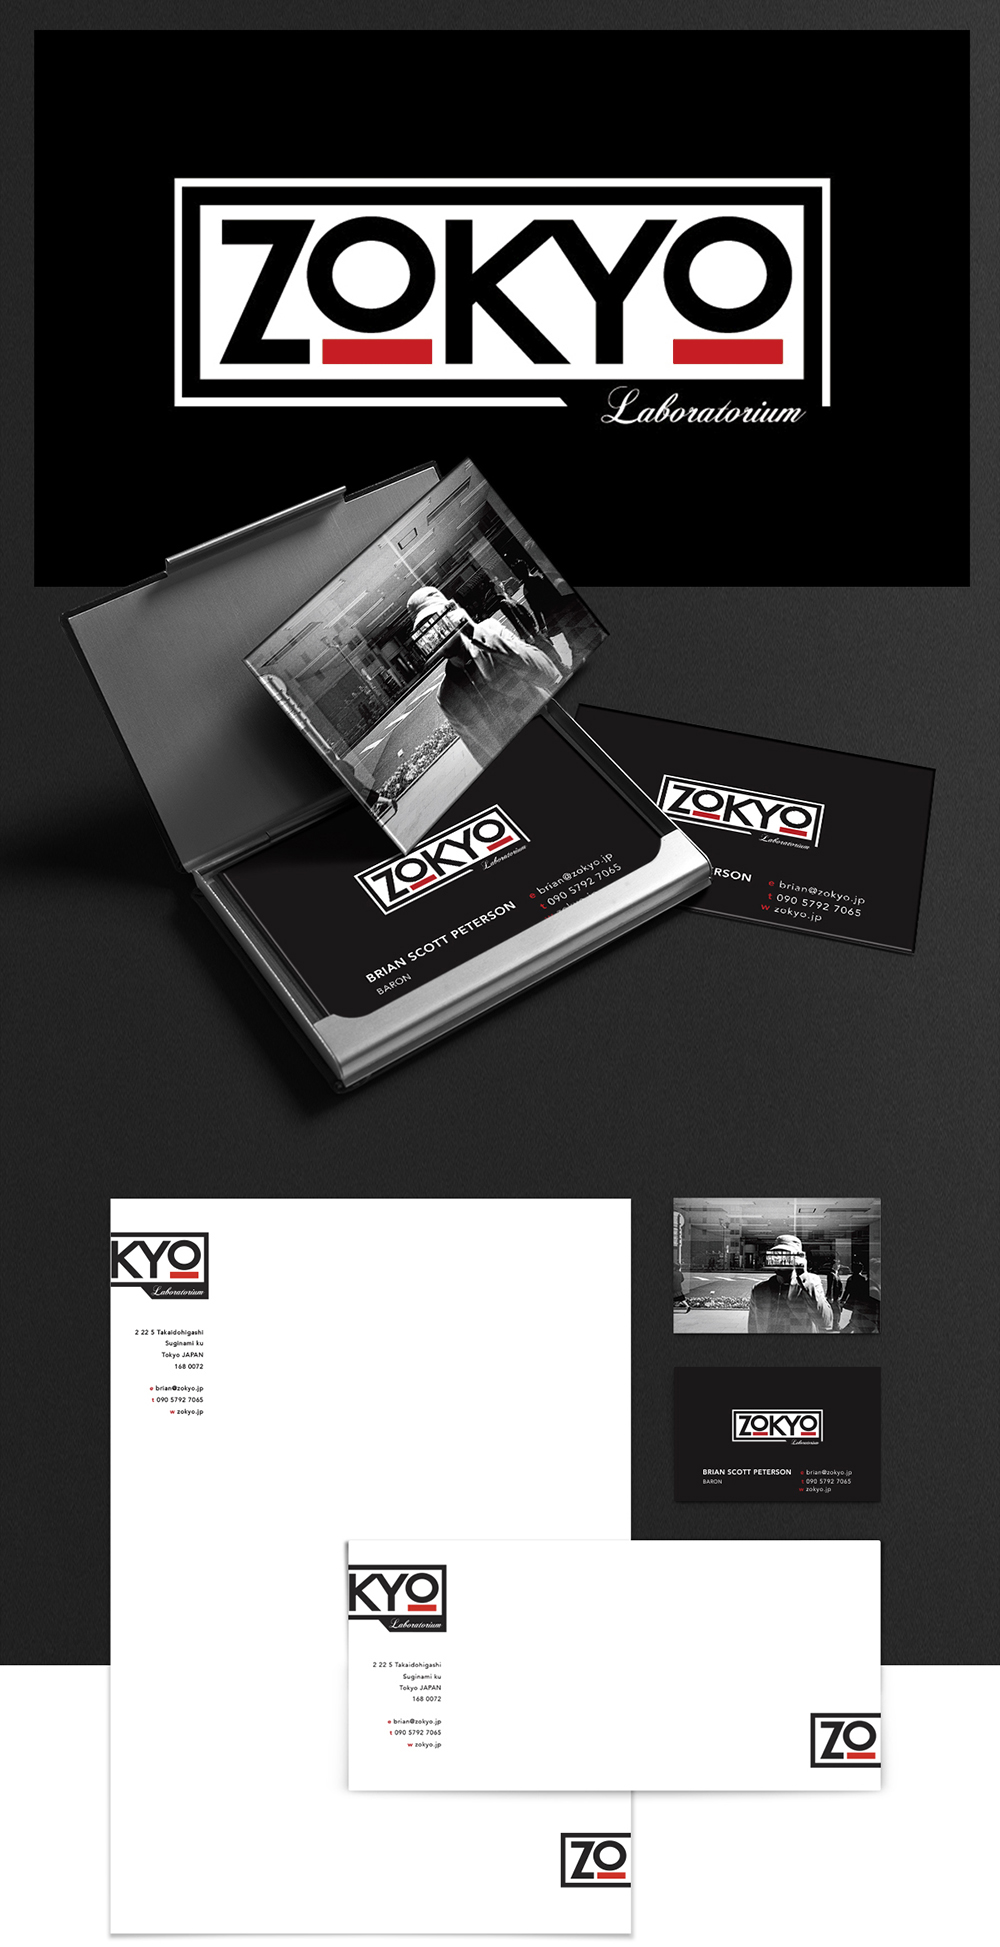 Zokyo_card_mock_all.jpg